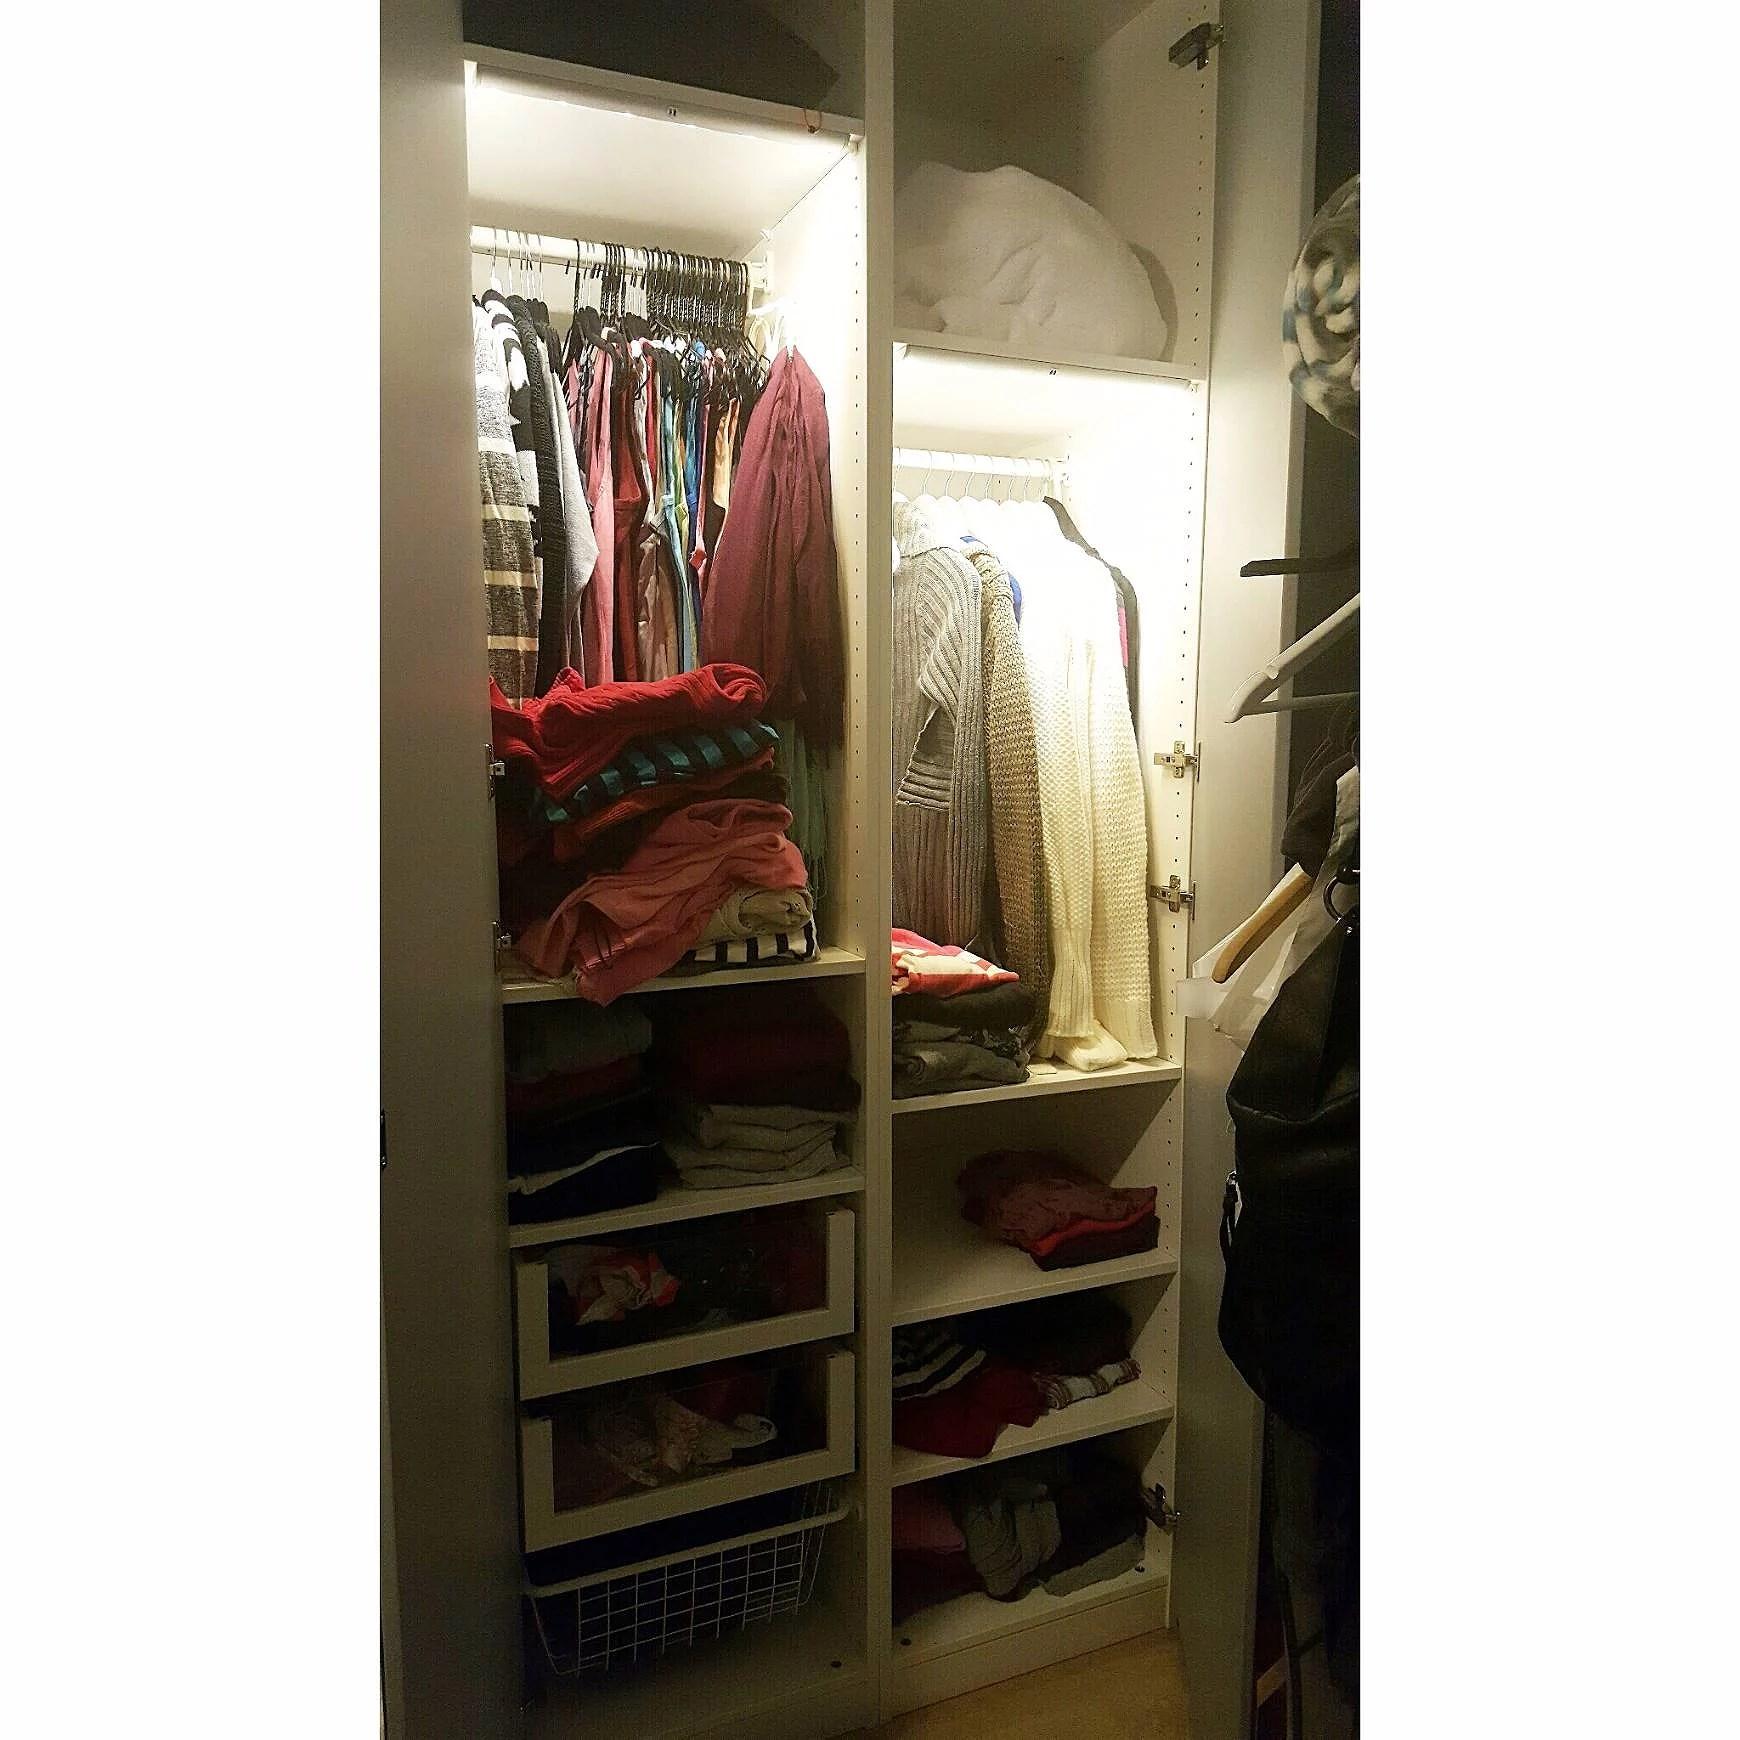 Projekt rensa garderob påbörjad.